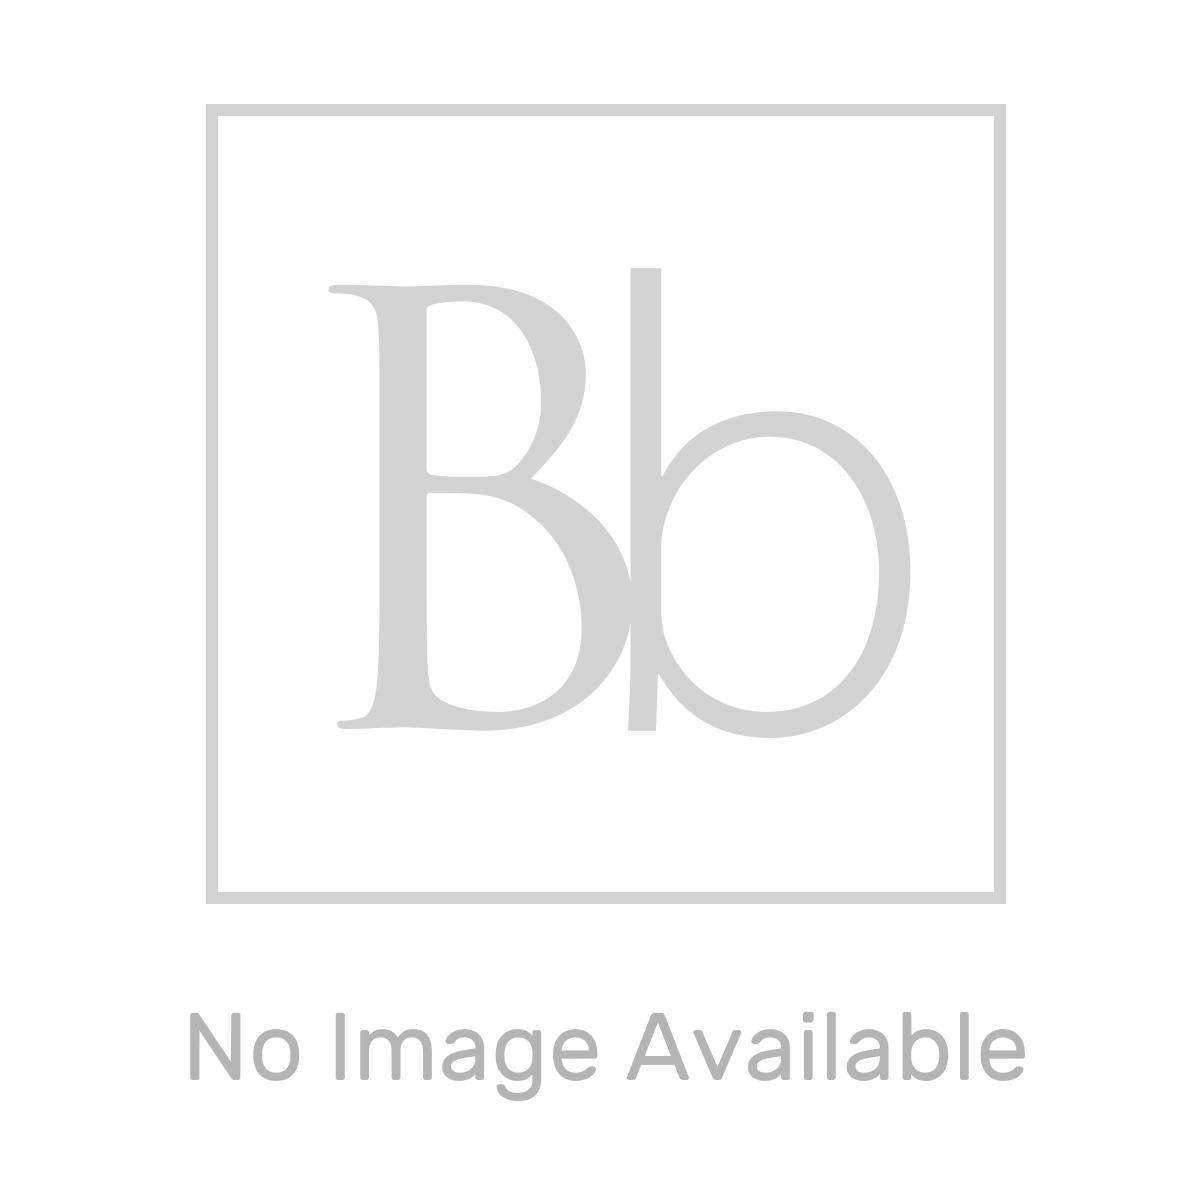 RAK Washington Greige Bathroom Mirror 650mm Measurements